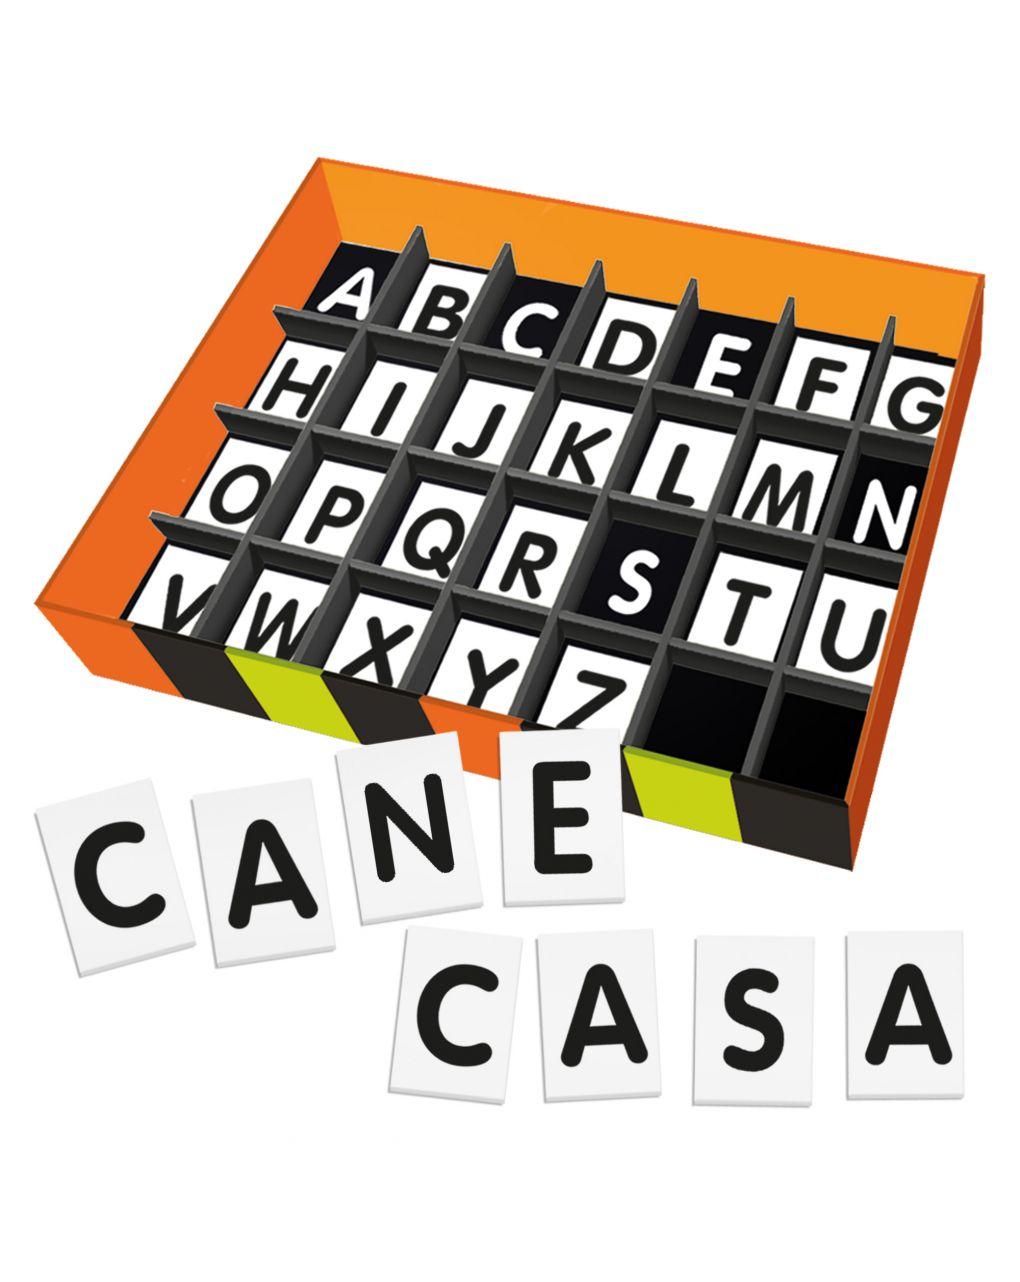 Headu - giocolibro leggo e scrivo montessori - Headu